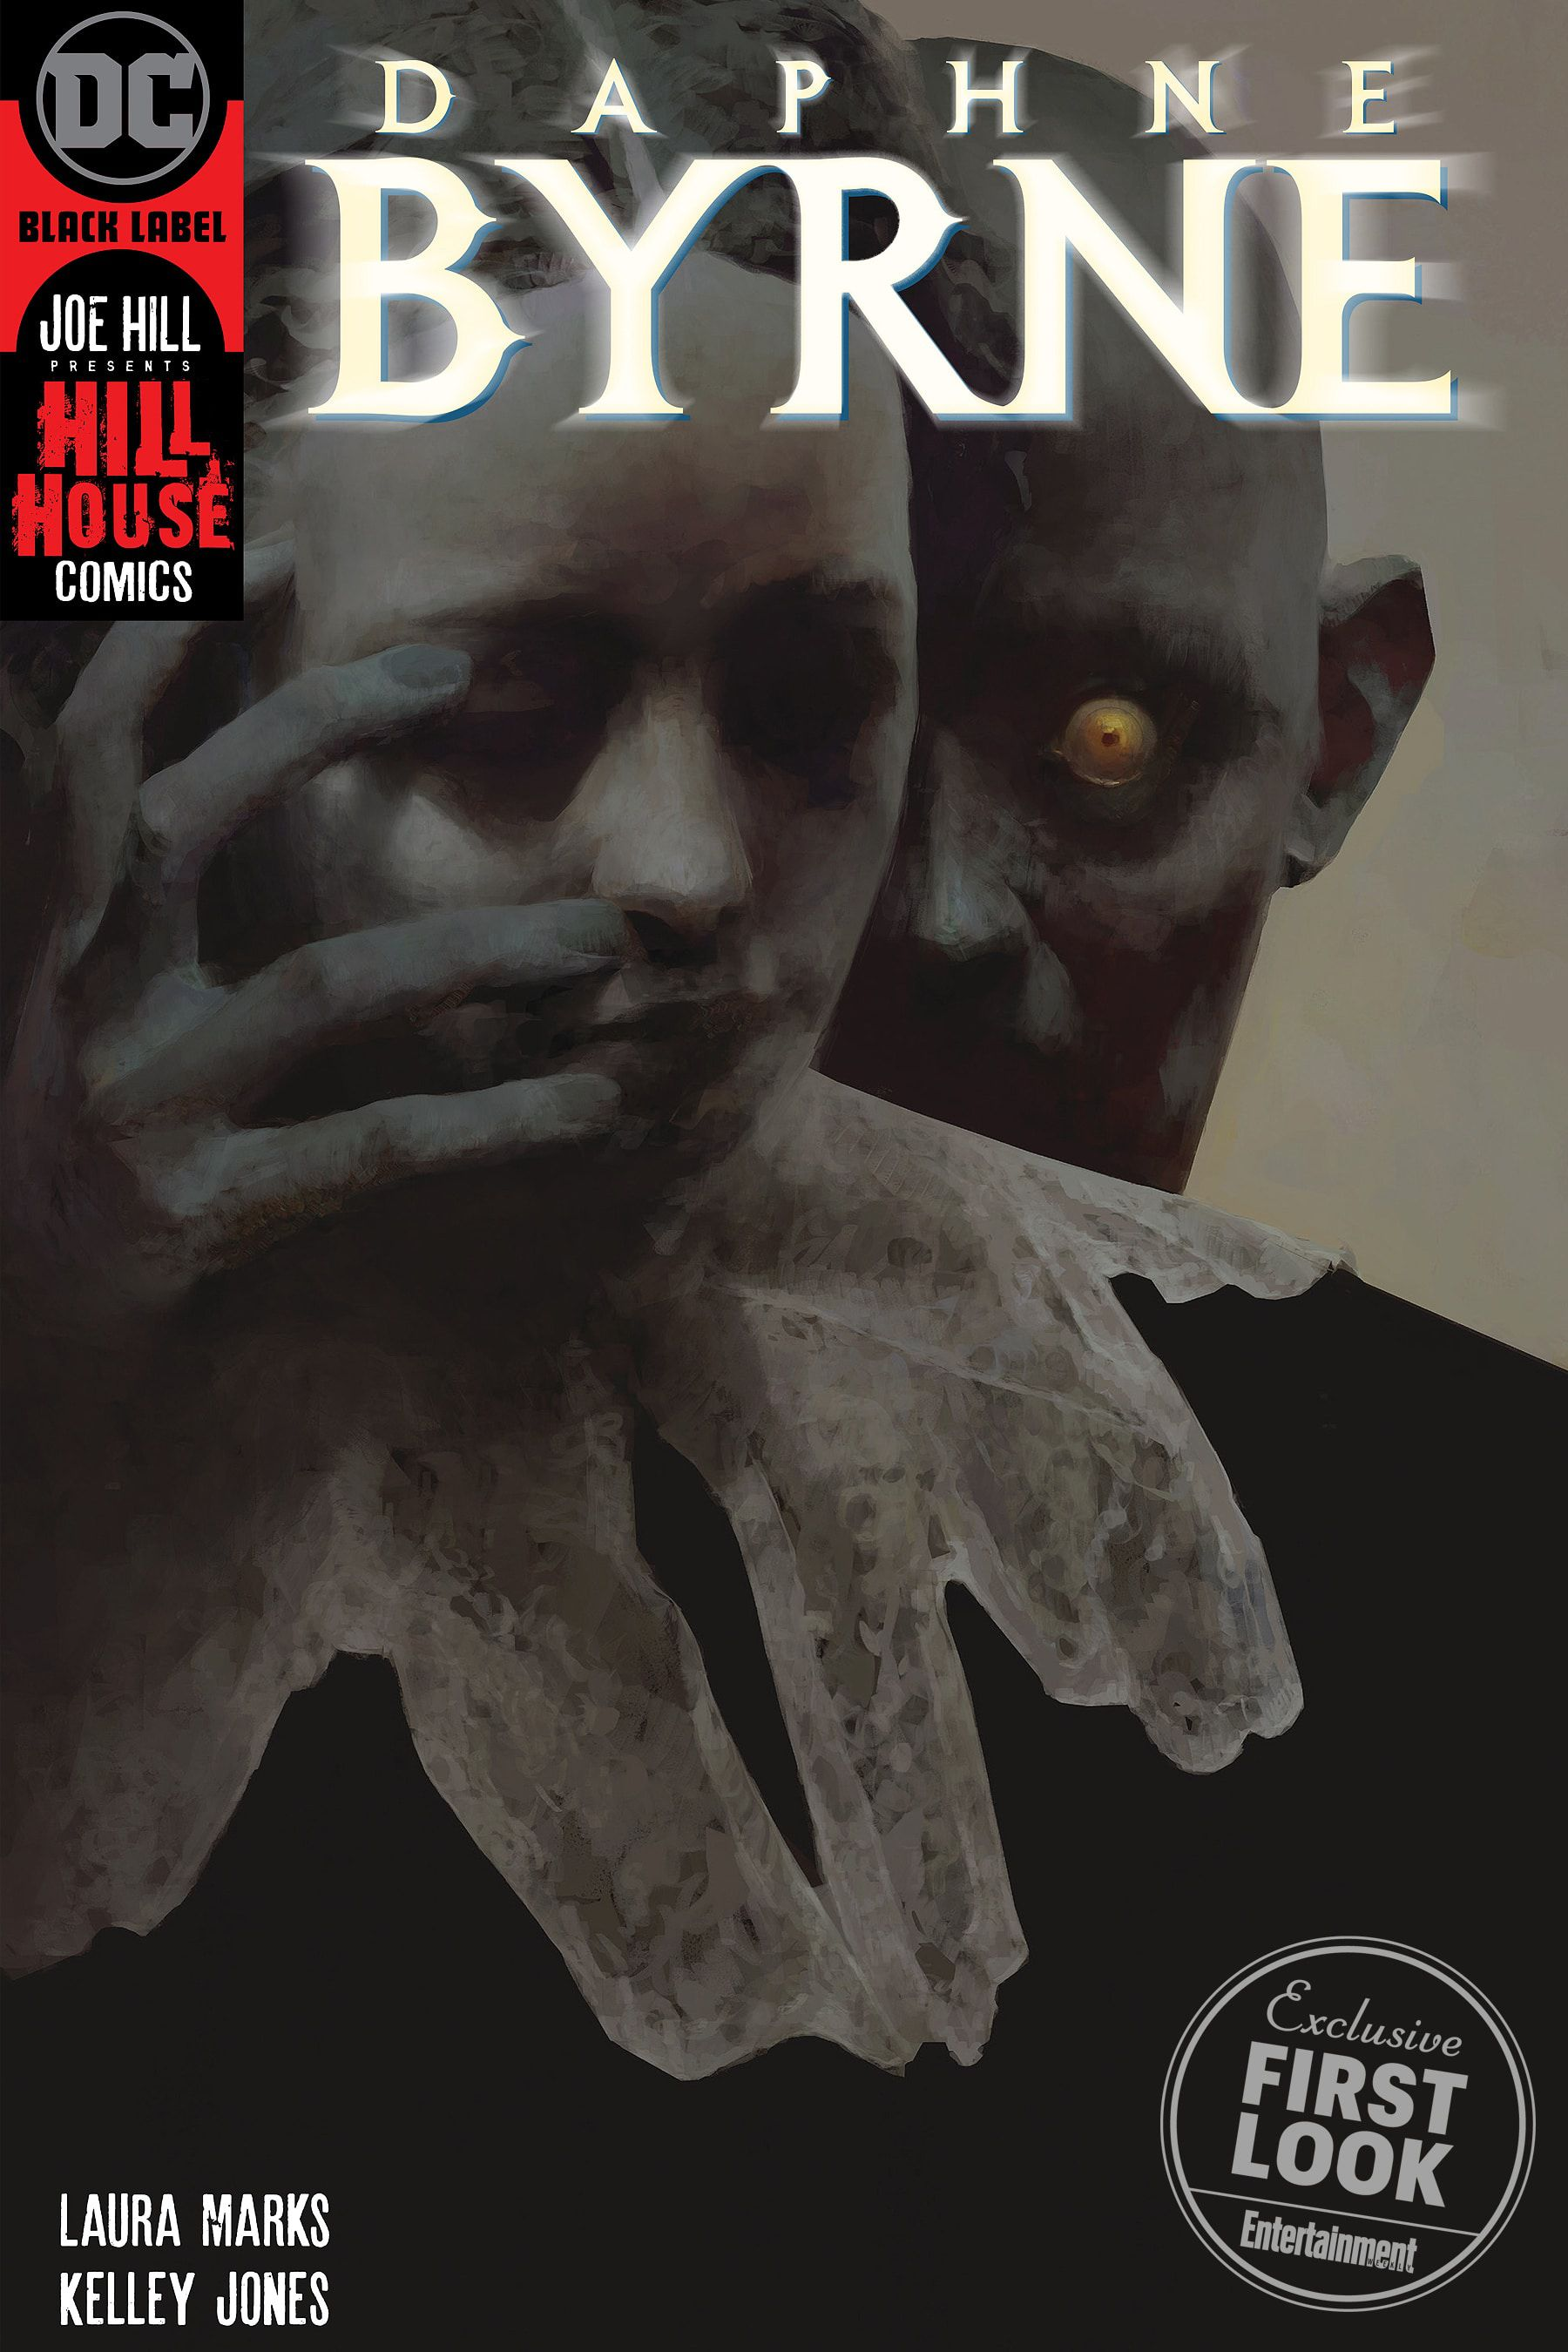 Joe Hill lance Hill House Comics